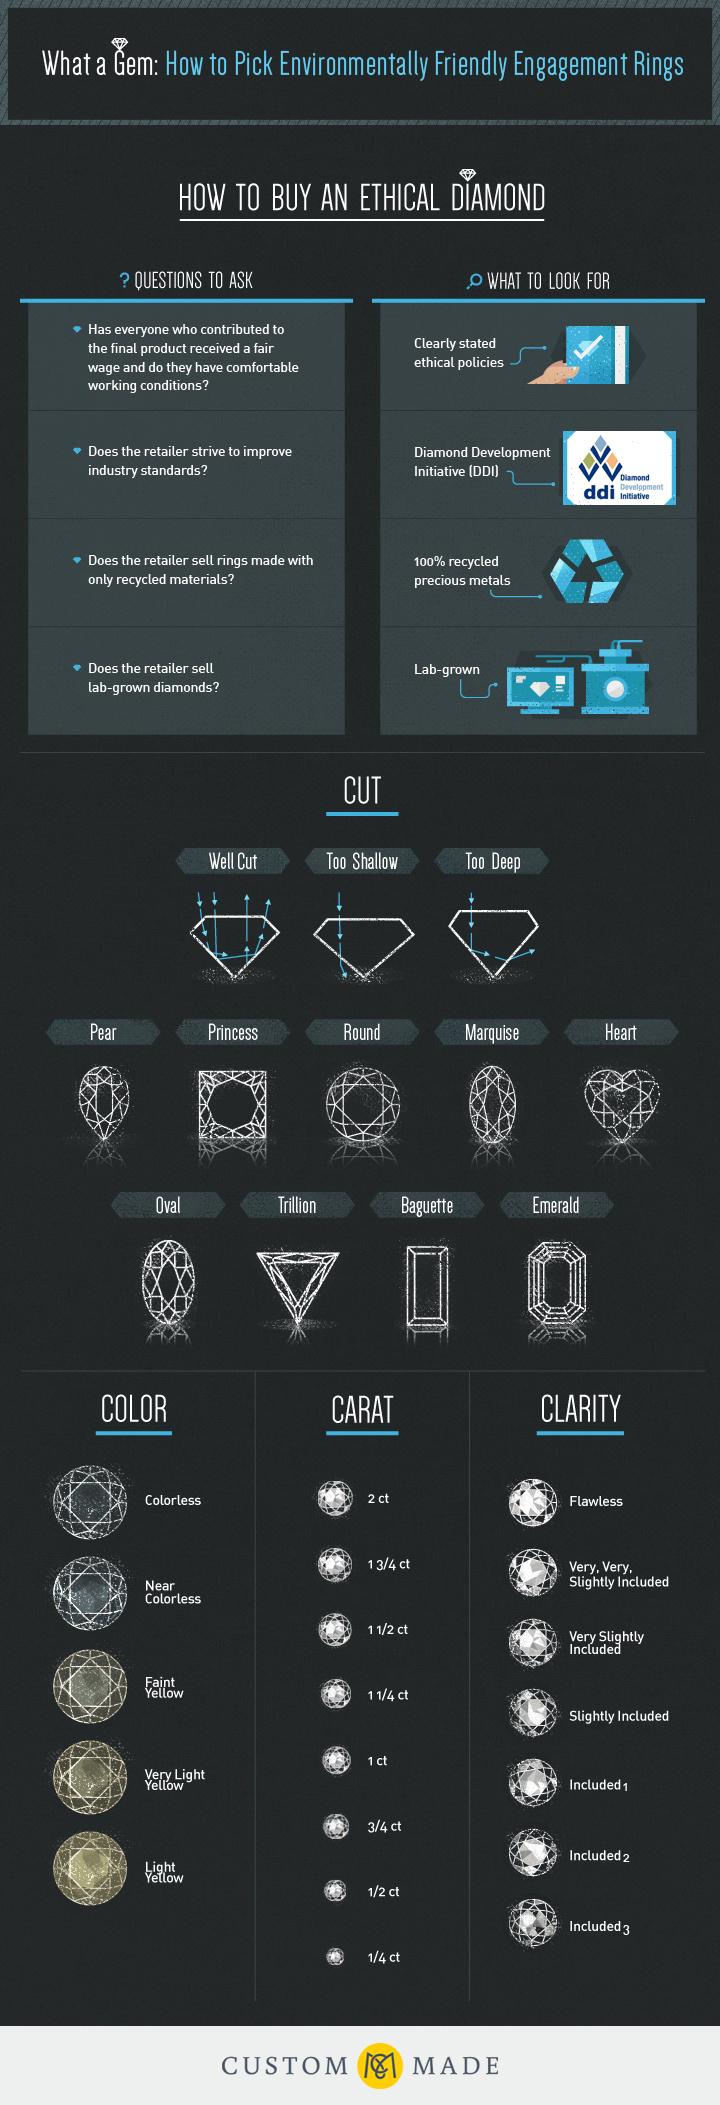 diamond ethical